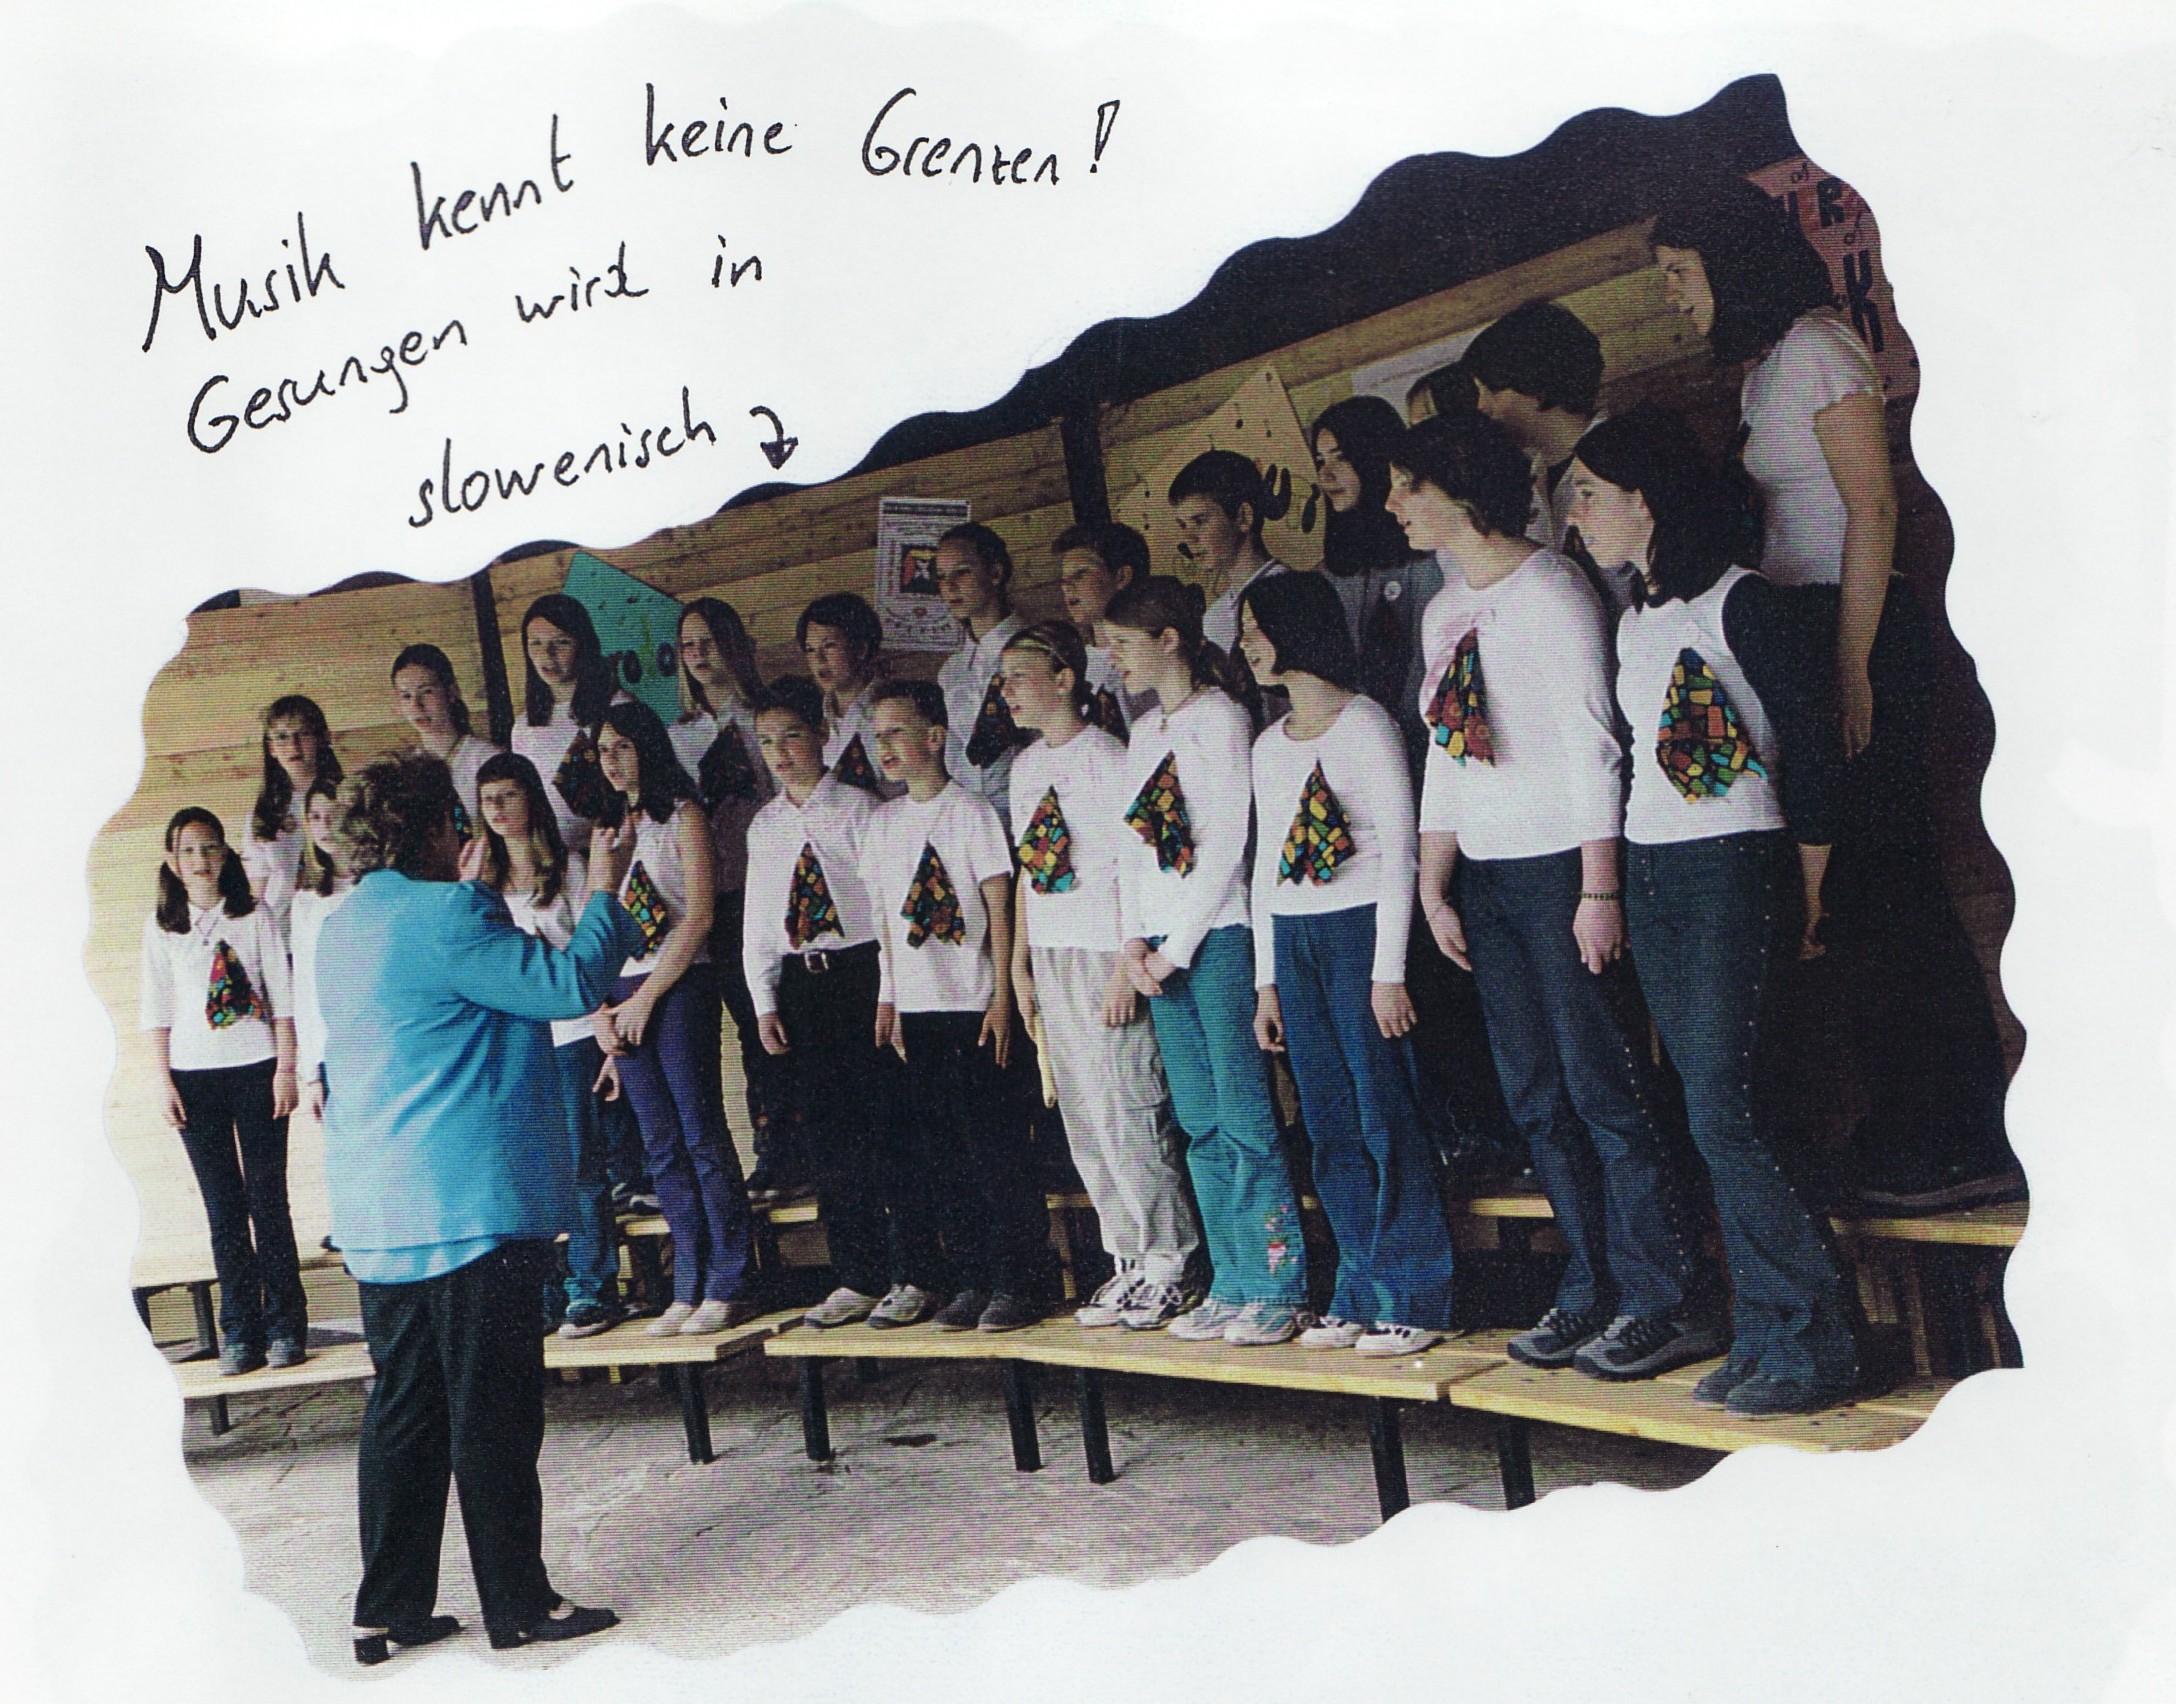 Klassenchor aus Slowenien